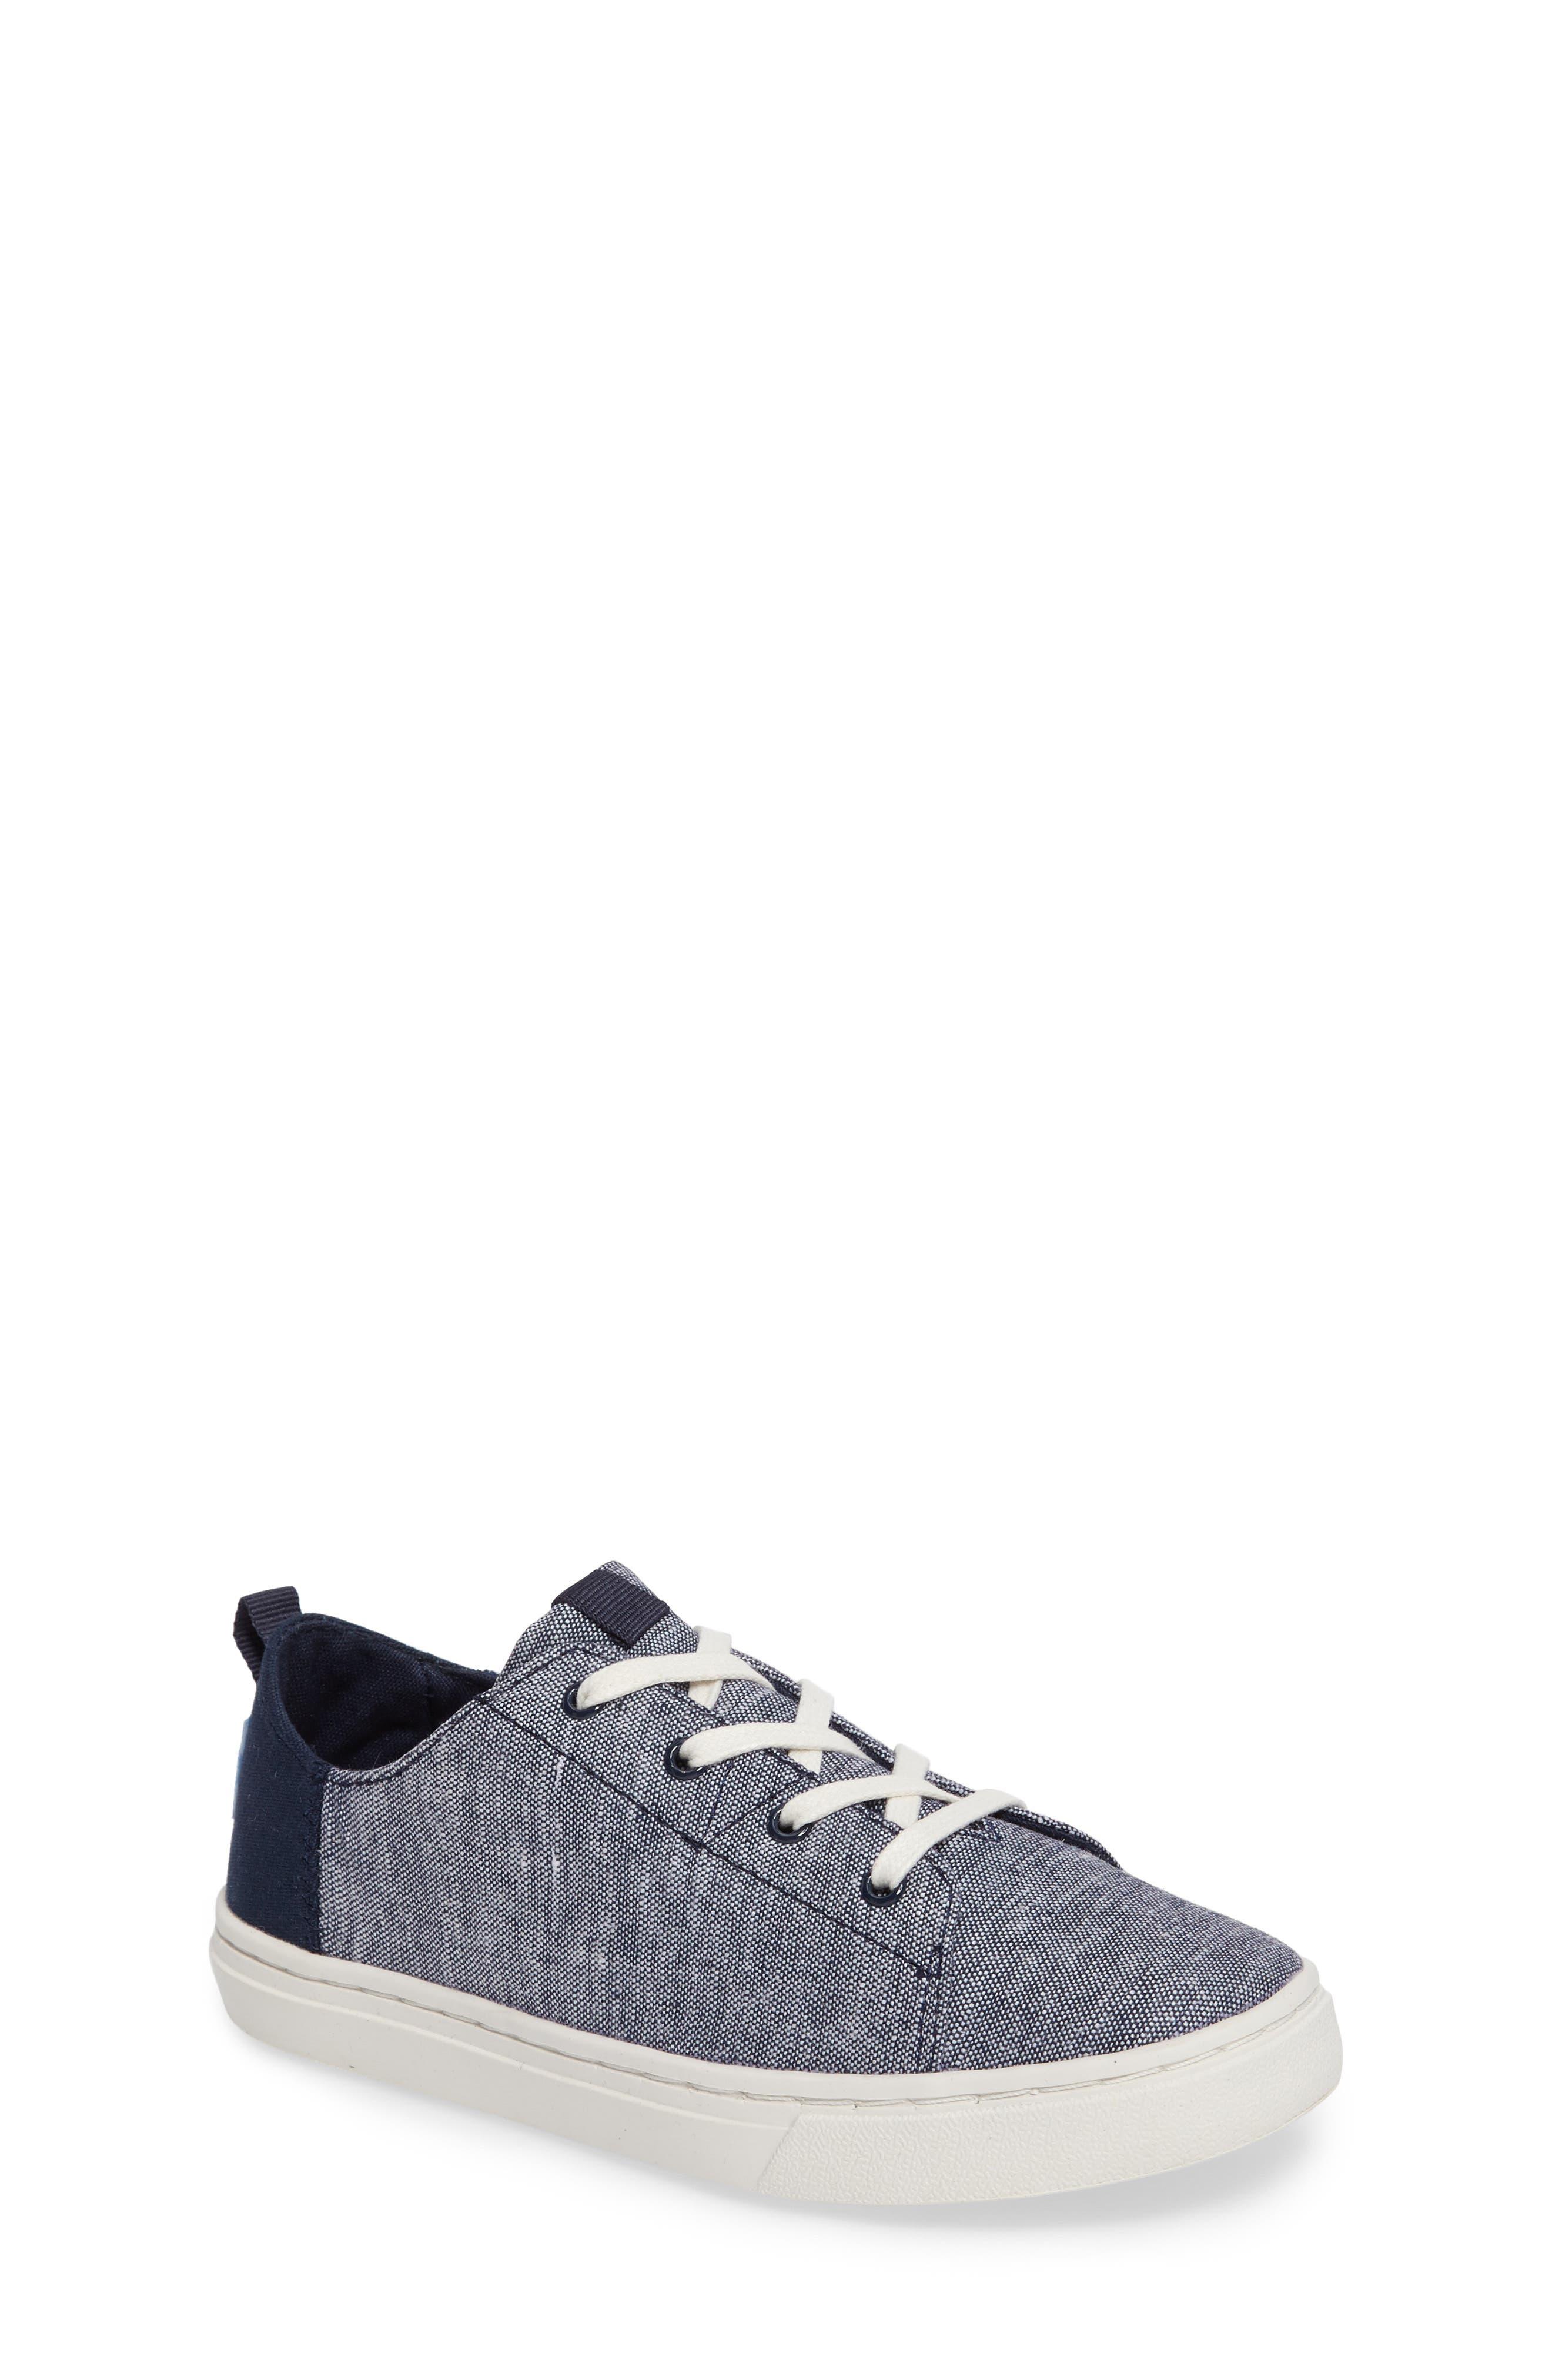 Lenny Sneaker,                             Main thumbnail 1, color,                             NAVY CHAMBRAY